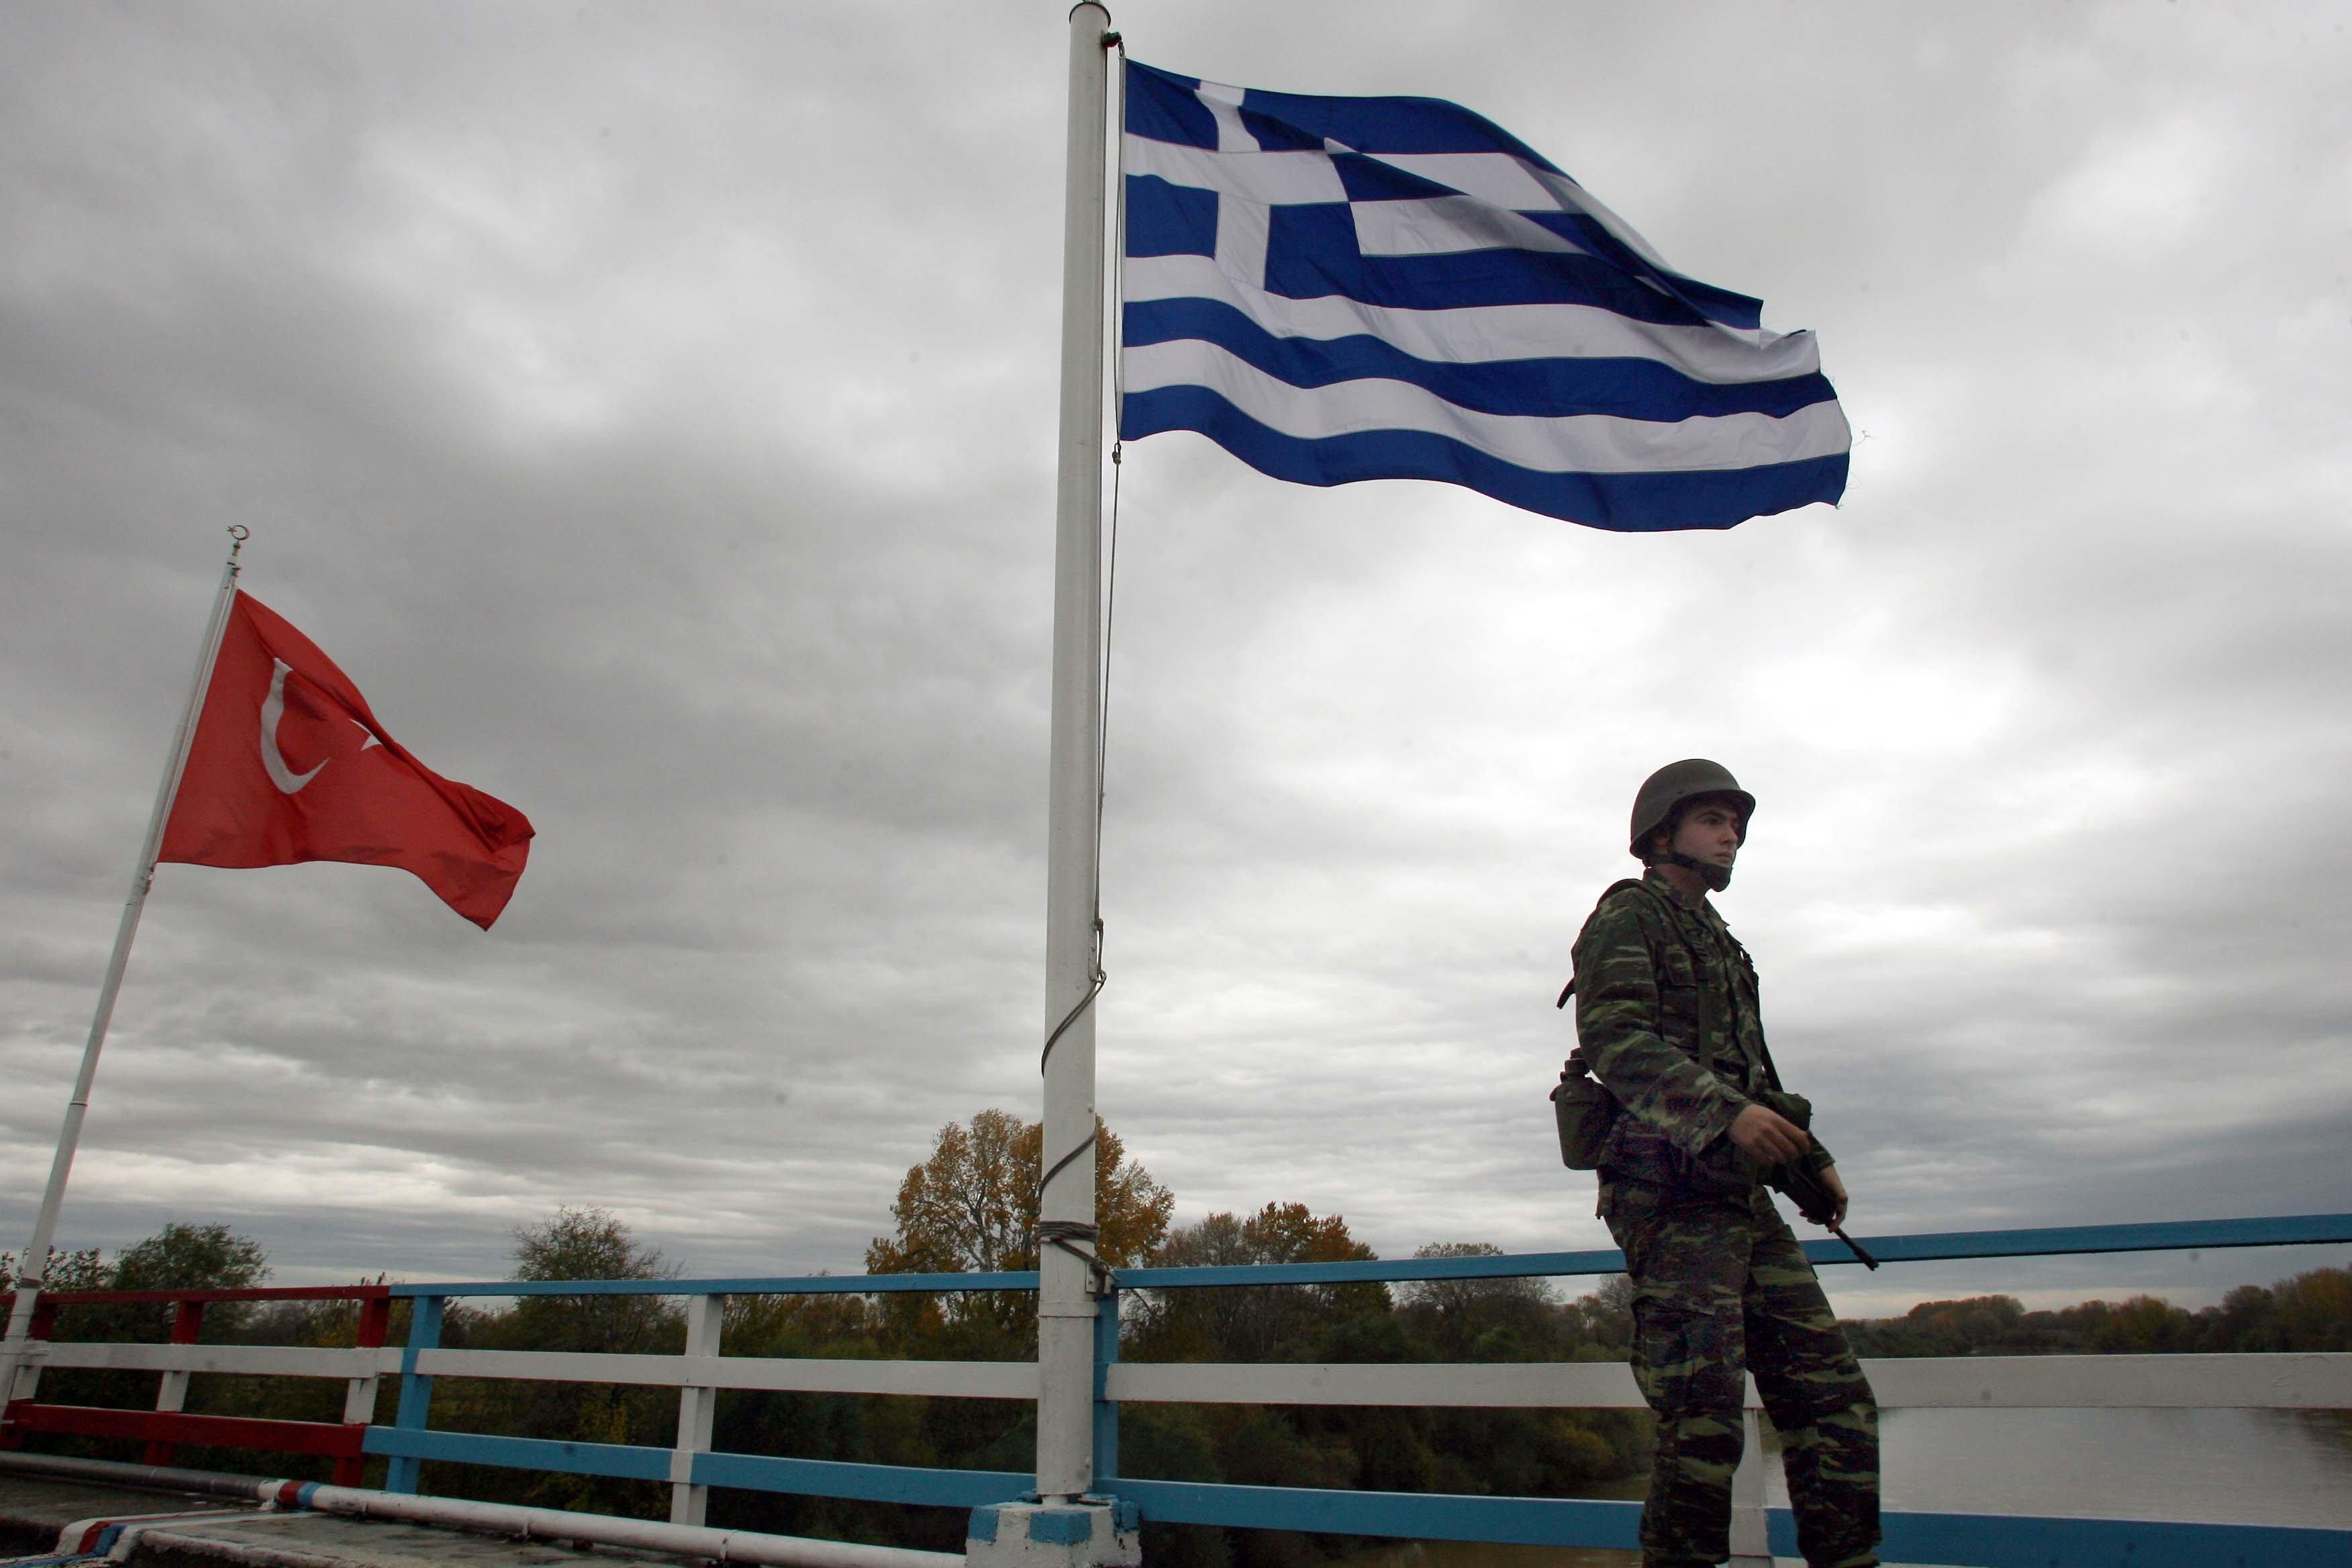 Handelsblatt: Αιτία για κλιμάκωση της κρίσης ανάμεσα σε Τουρκία και Ελλάδα η σύλληψη των δύο